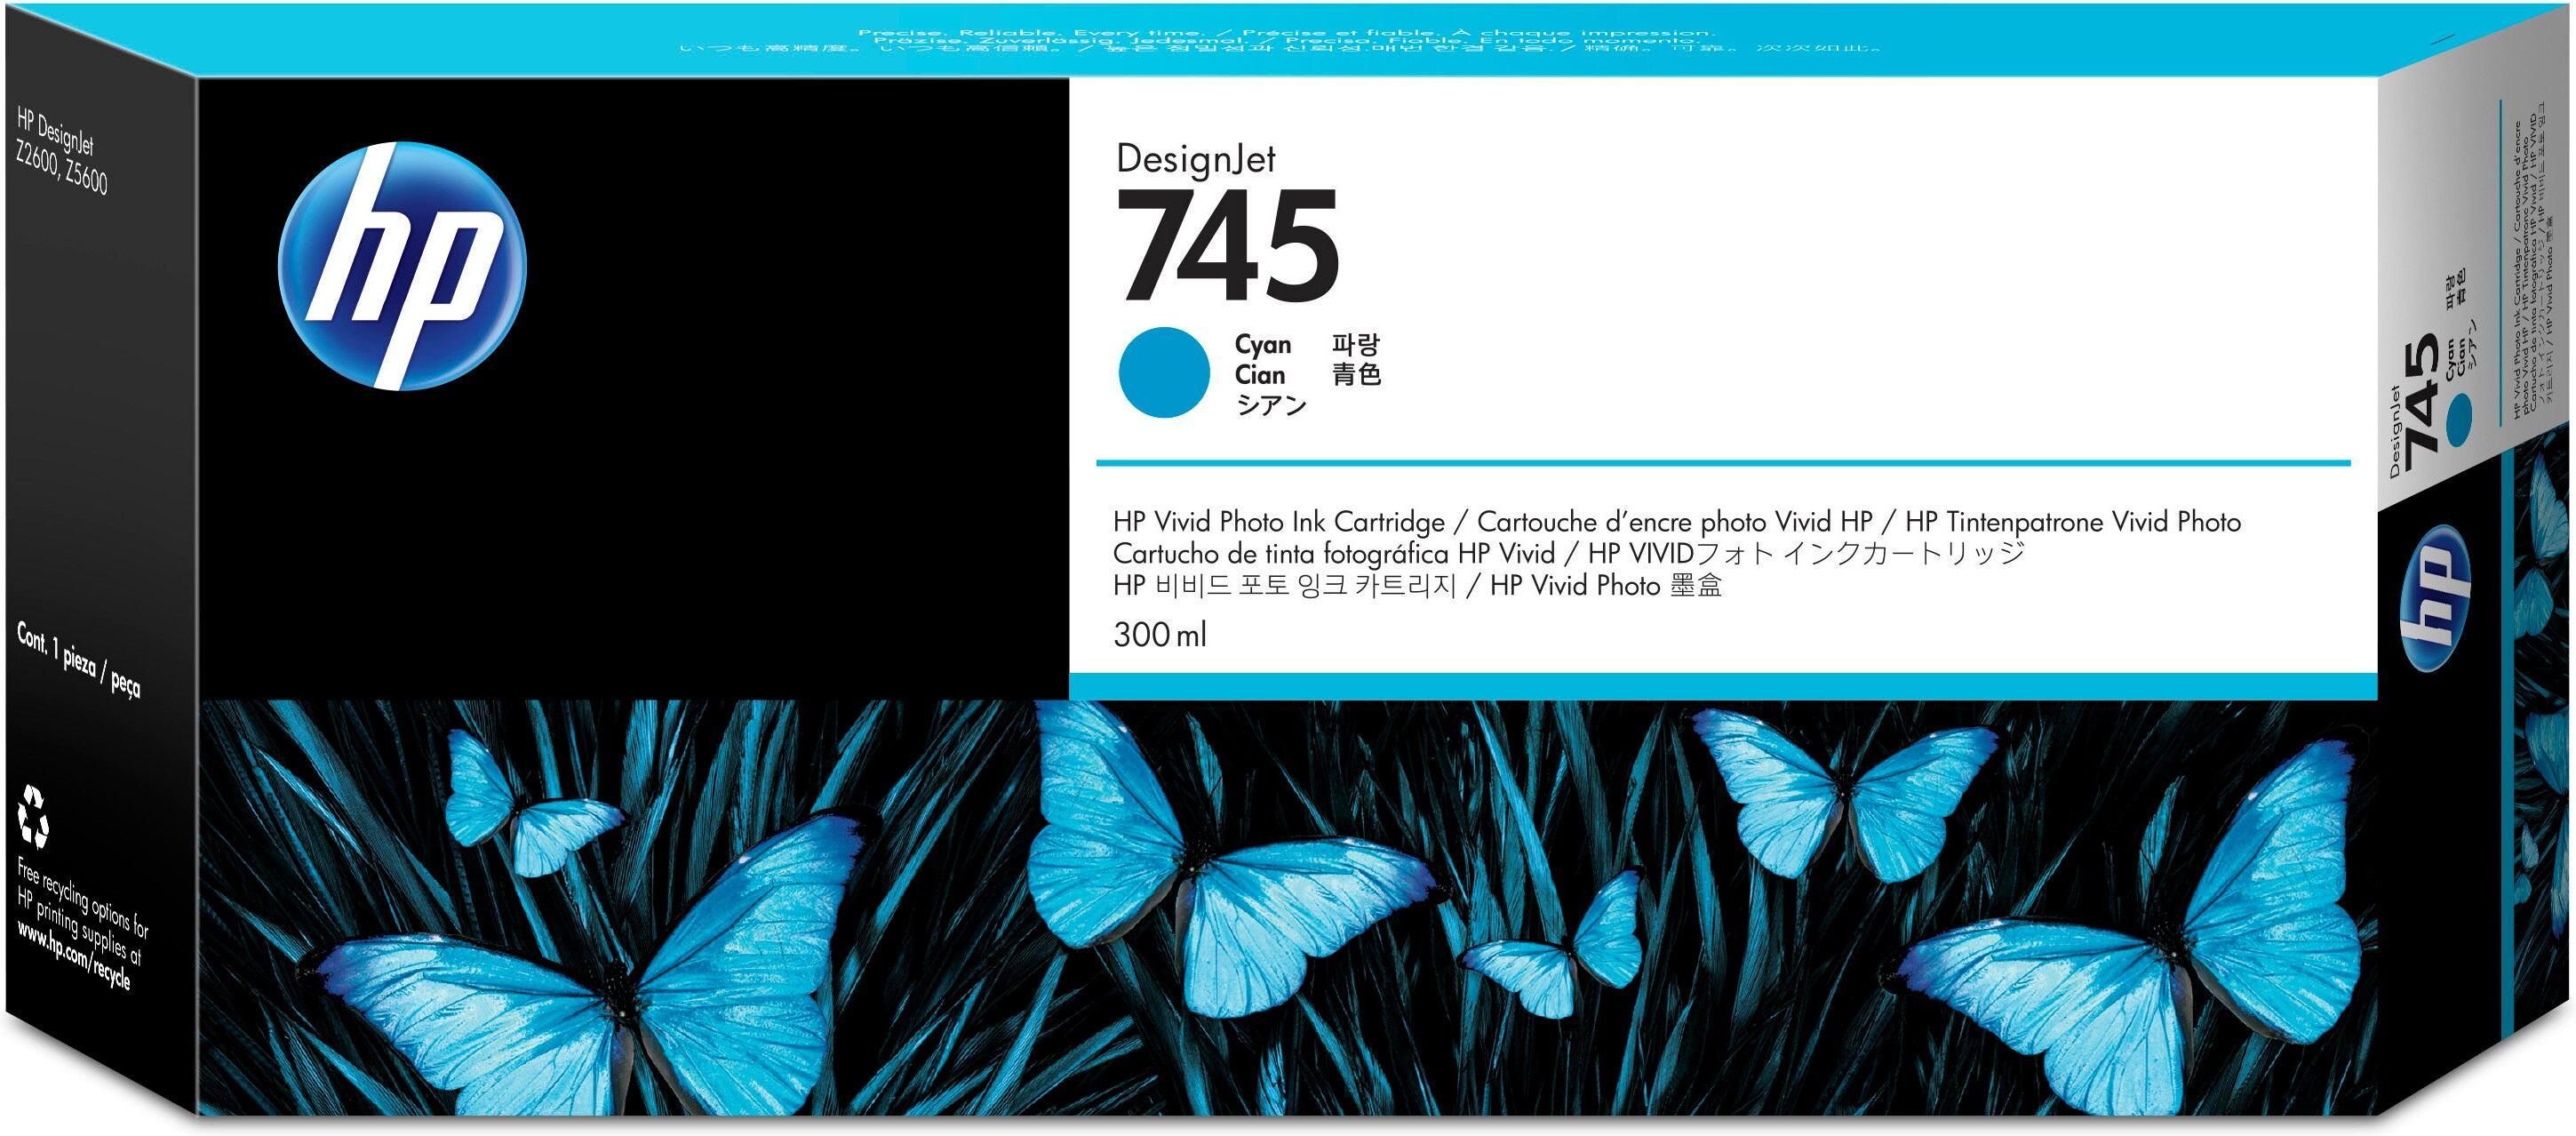 2022274-HP-745-Originale-Ciano-HP-745-300-ml-mit-hoher-Kapazitat-Cyan-O